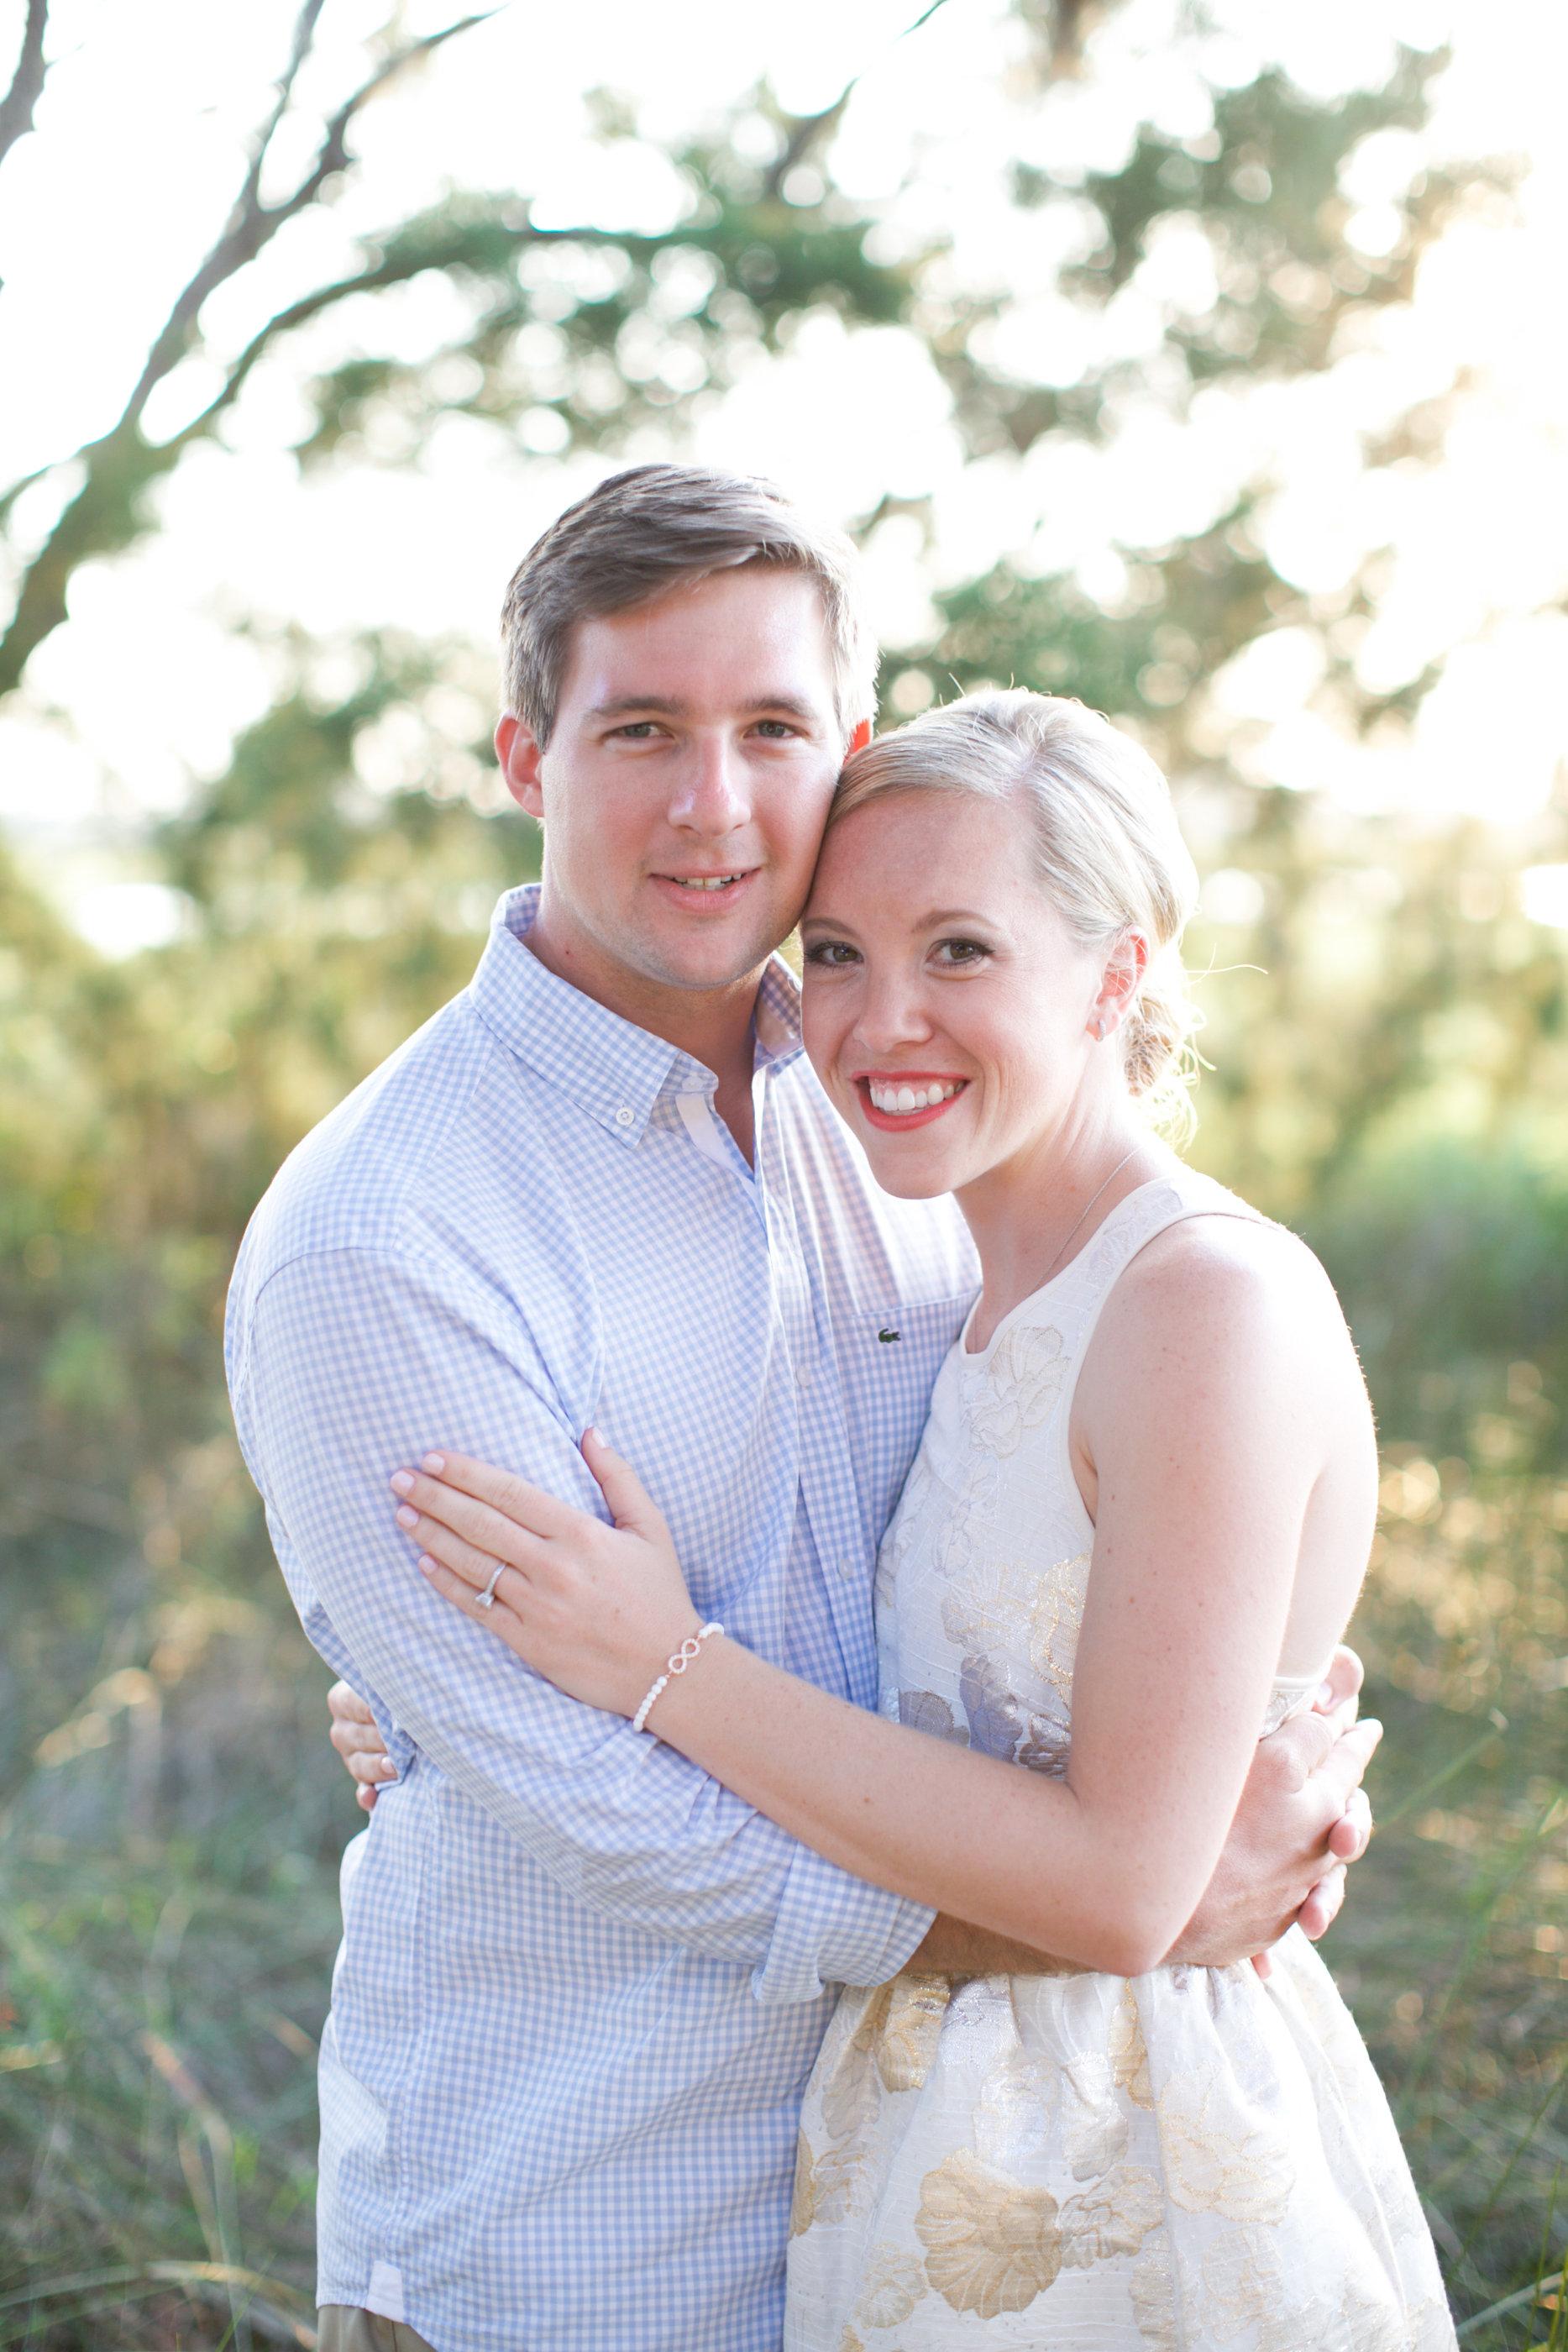 Couple Details - Kiawah Island, South Carolina - Fall Wedding - Julian Leaver Events